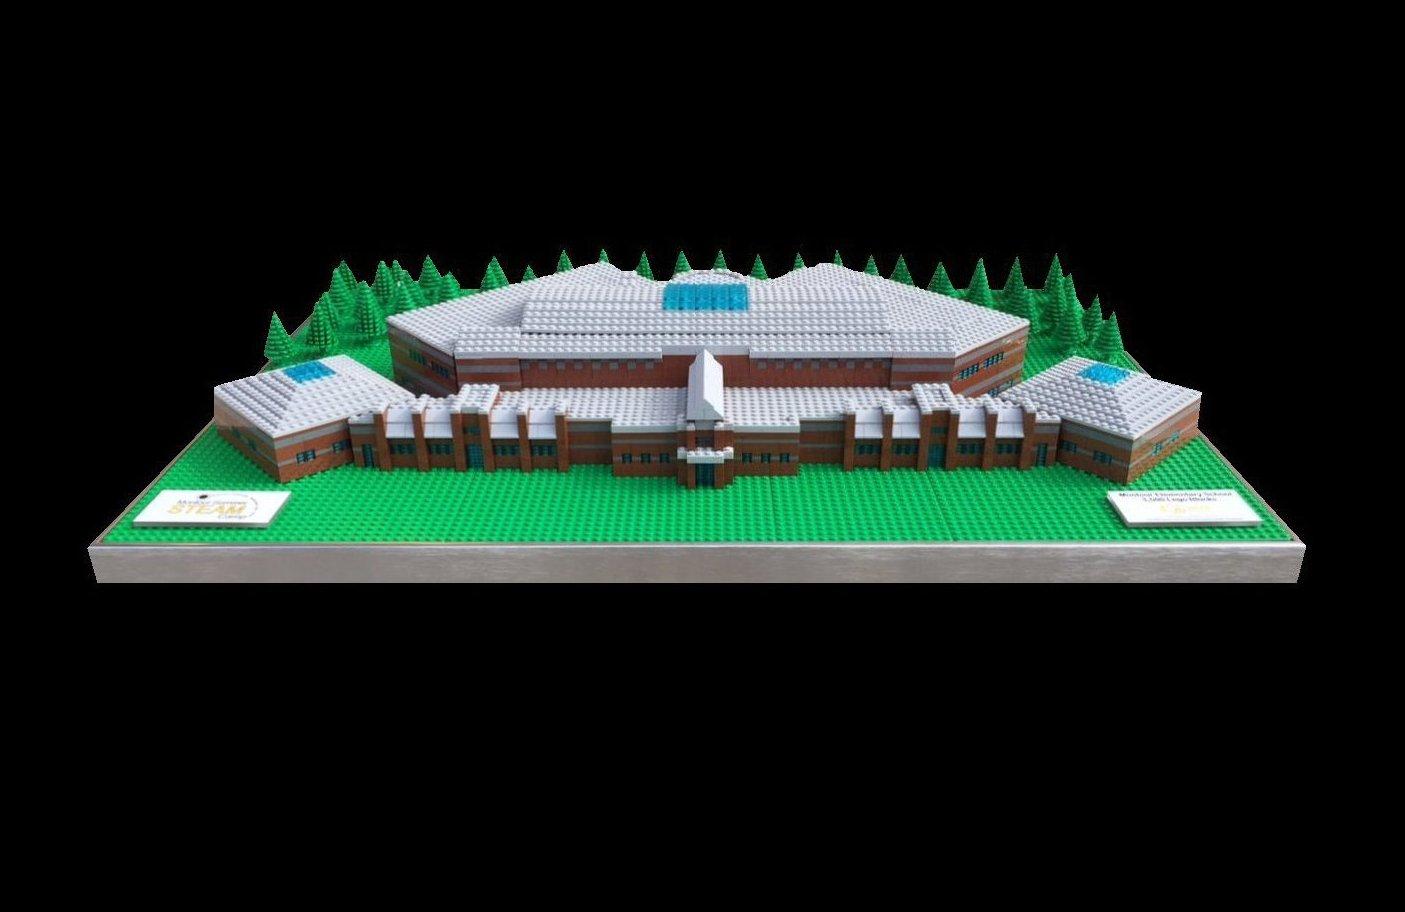 Montour Elementary School Lego Model